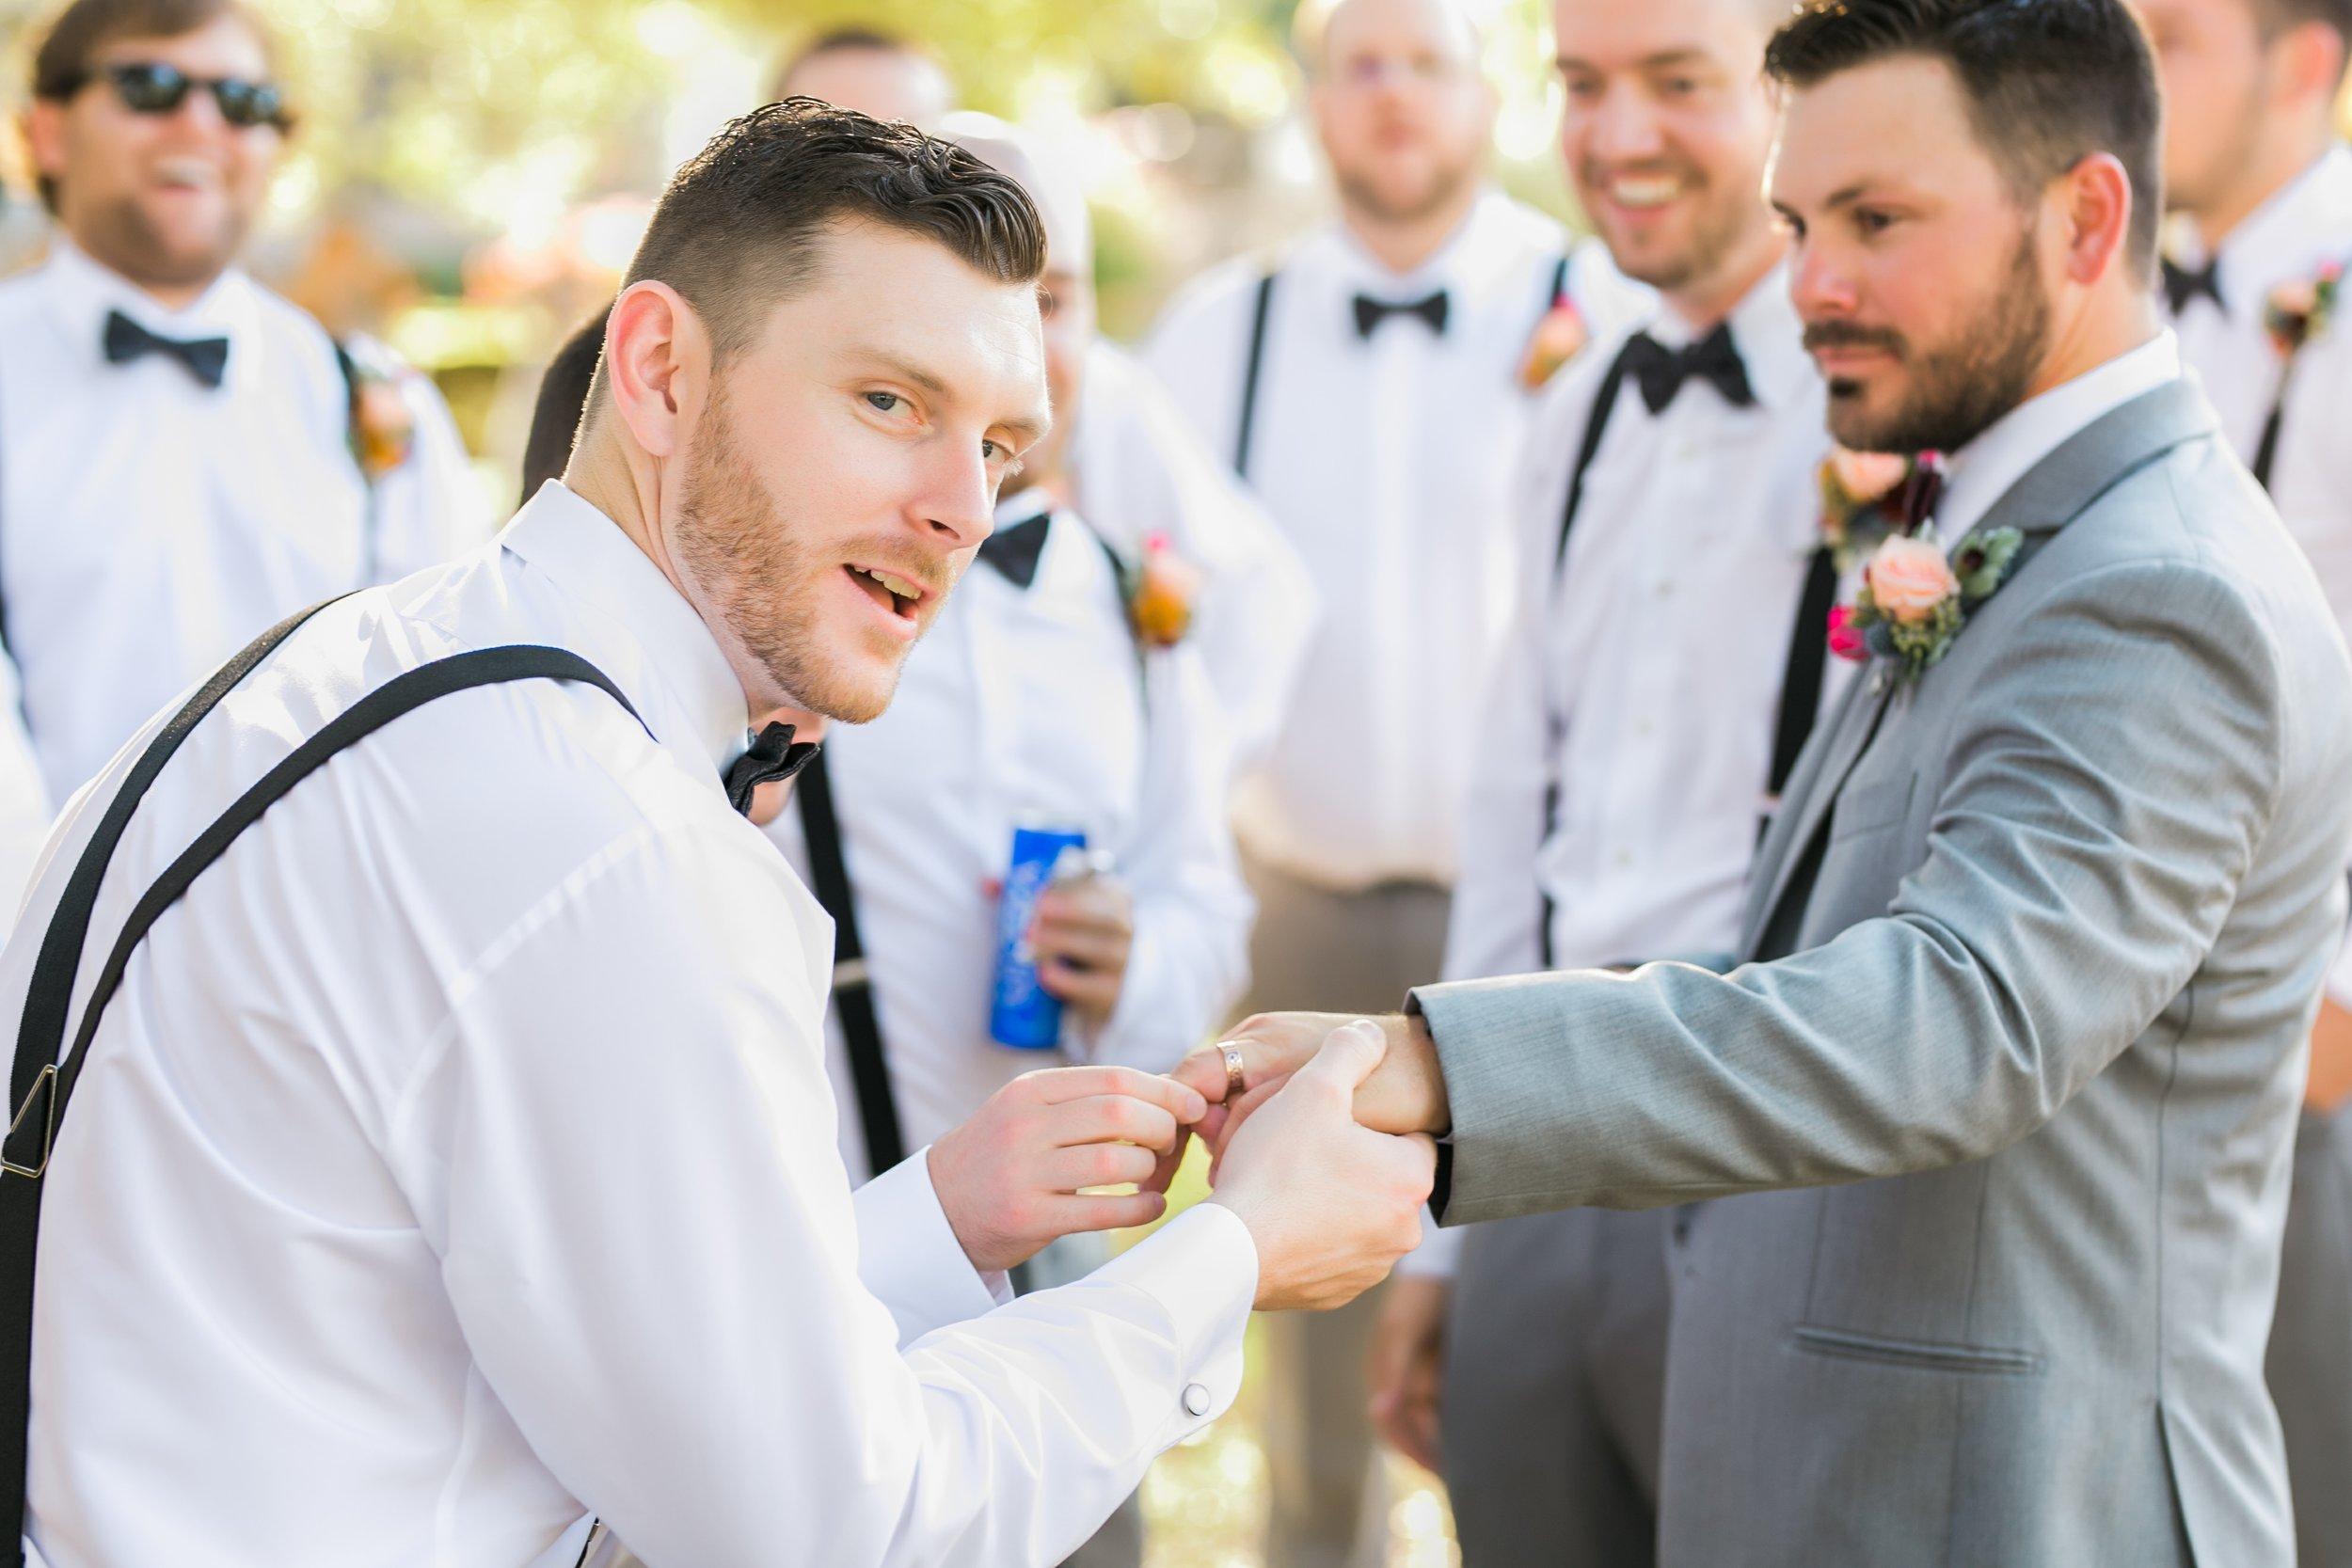 Roberson-Wedding-The-Forum-Lauren-Pinson-Wedding-Photography-Wichita-Falls-Texas-053.jpg